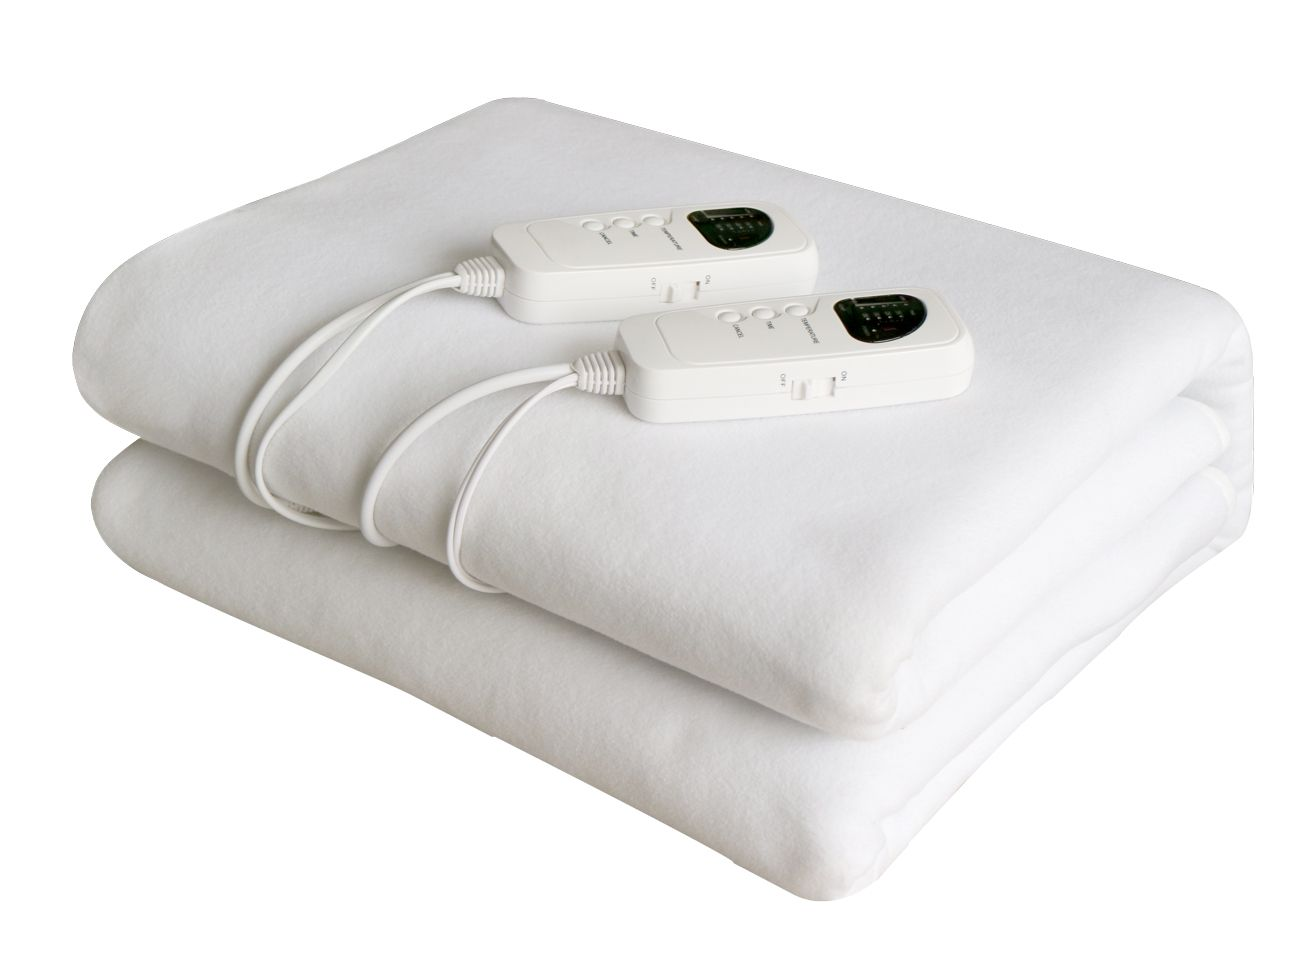 Lençol Térmico Cobertor Elétrico Kenko Queen Size 160x200cm Luxo Multi Temperaturas   - Kenko Premium Colchões